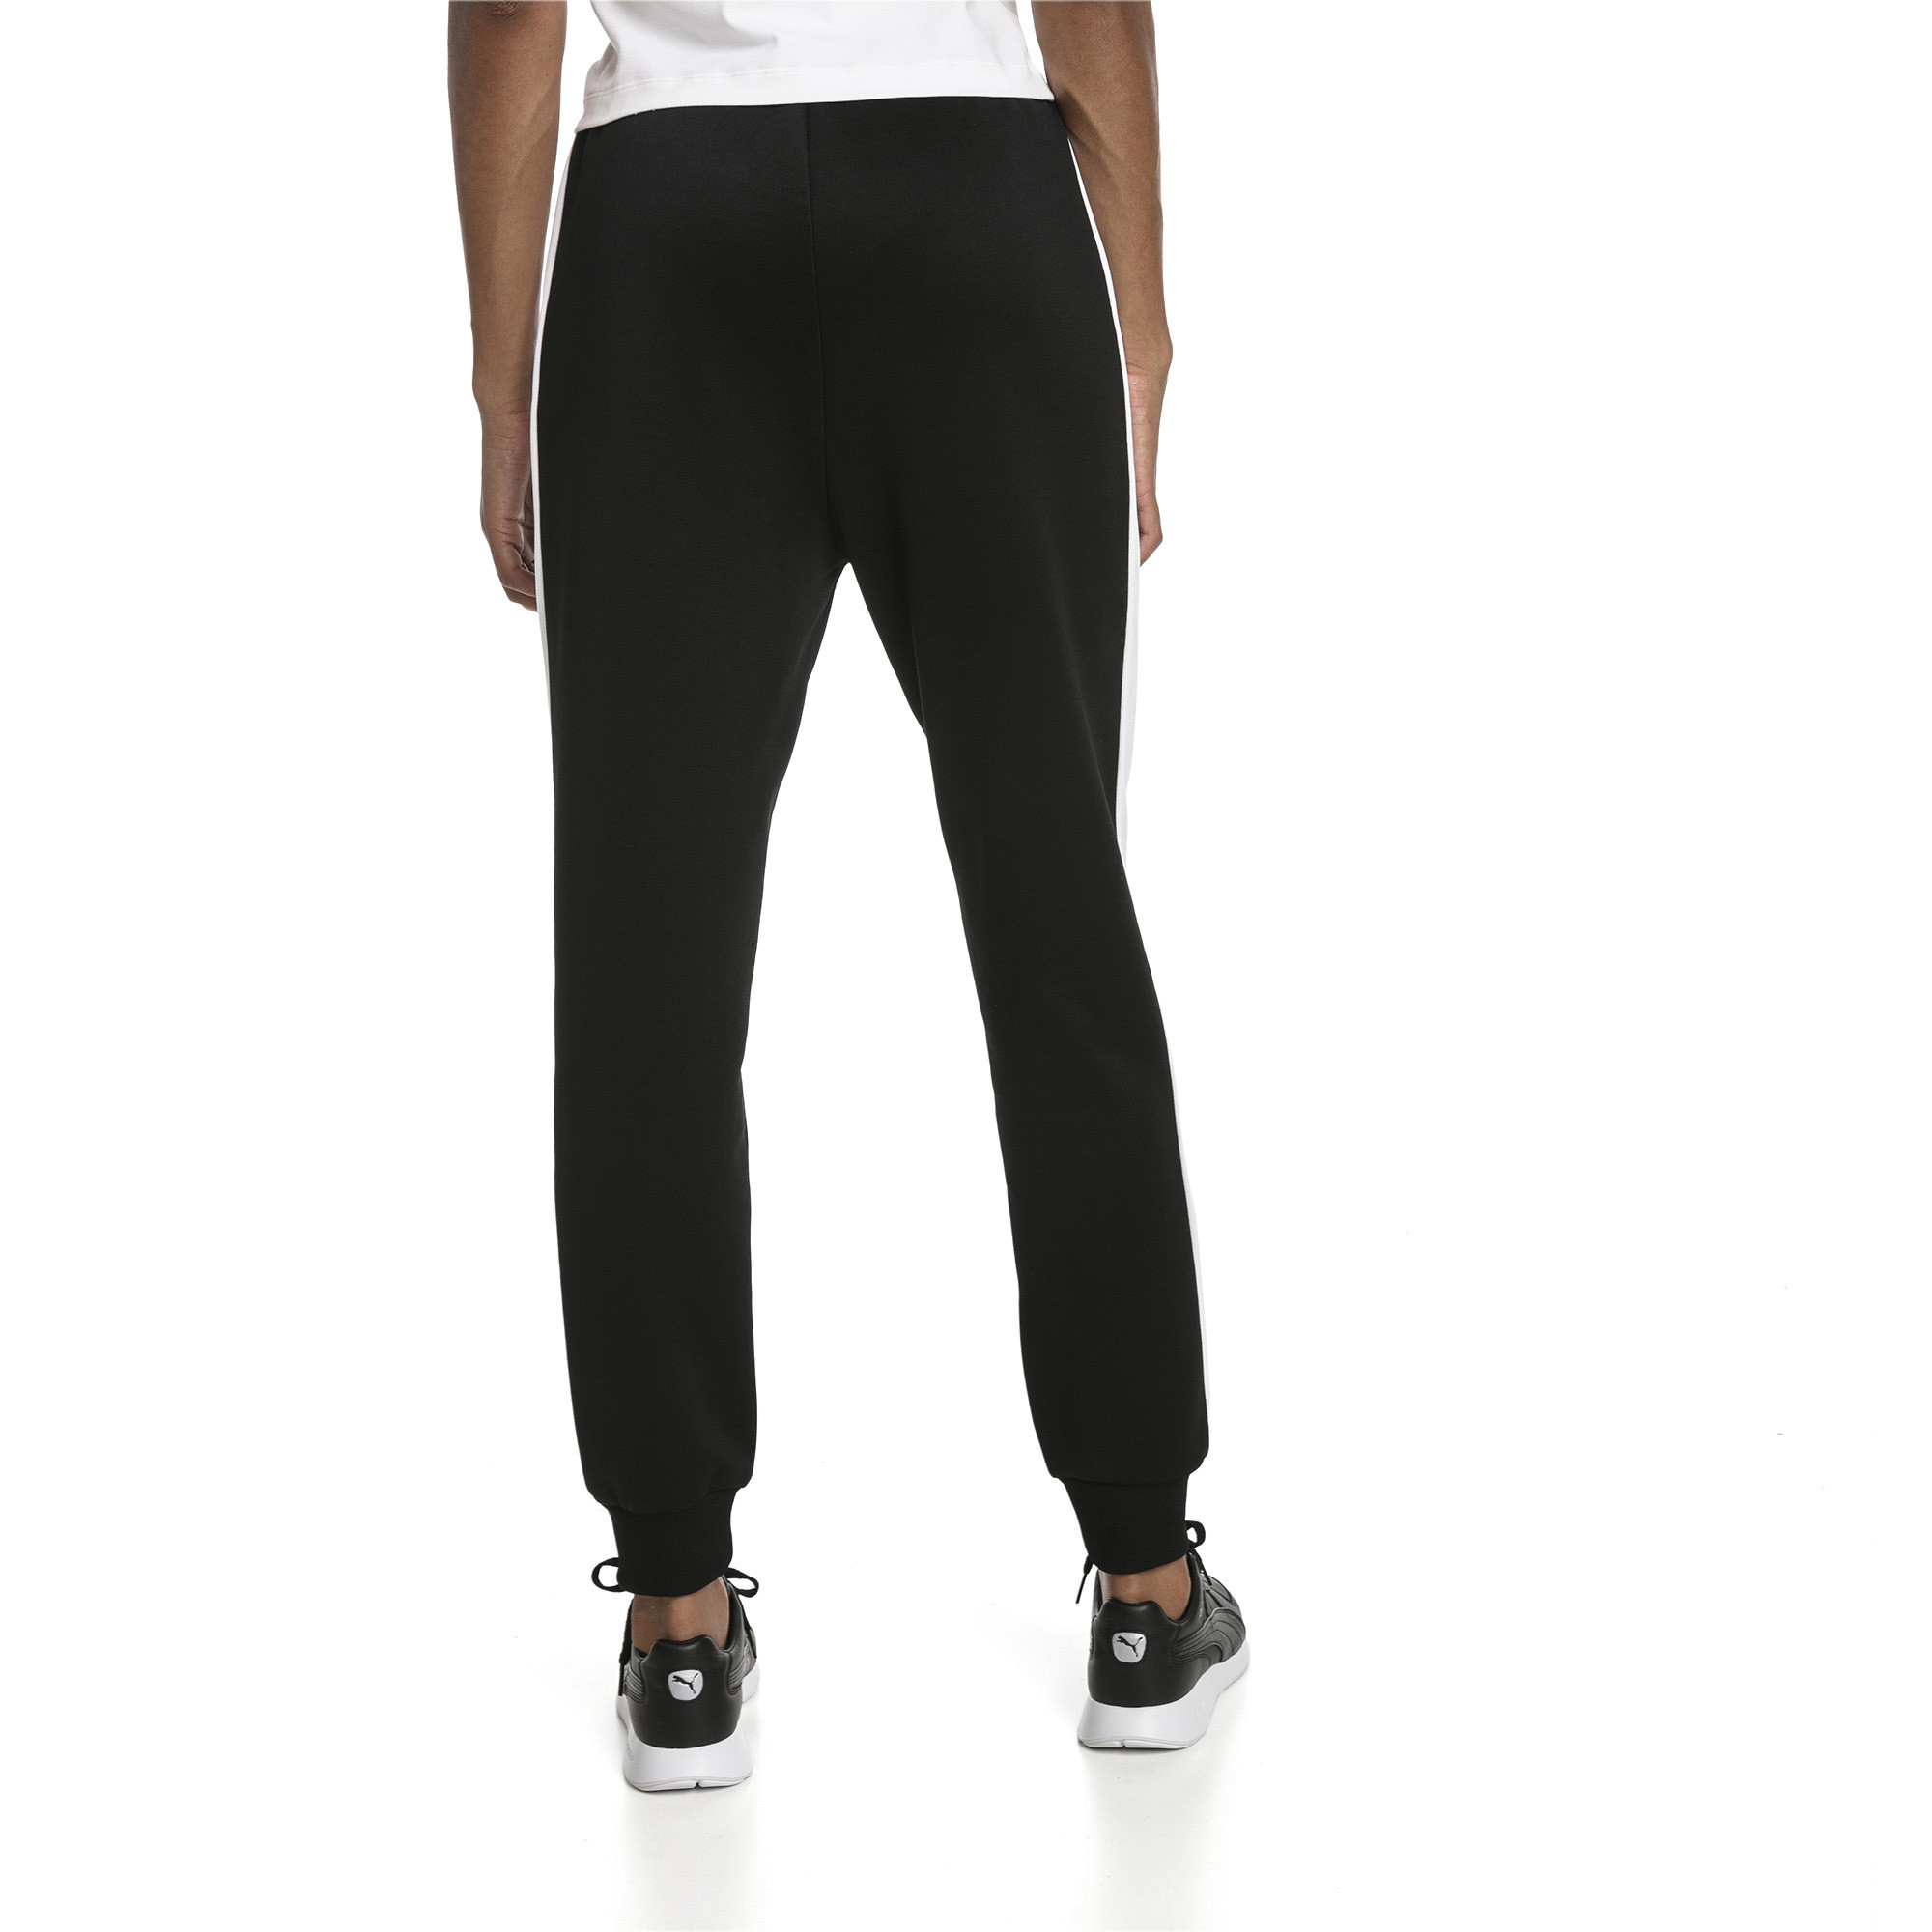 cccc070de Pantalones deportivos de tejido de punto Classics T7 para mujer